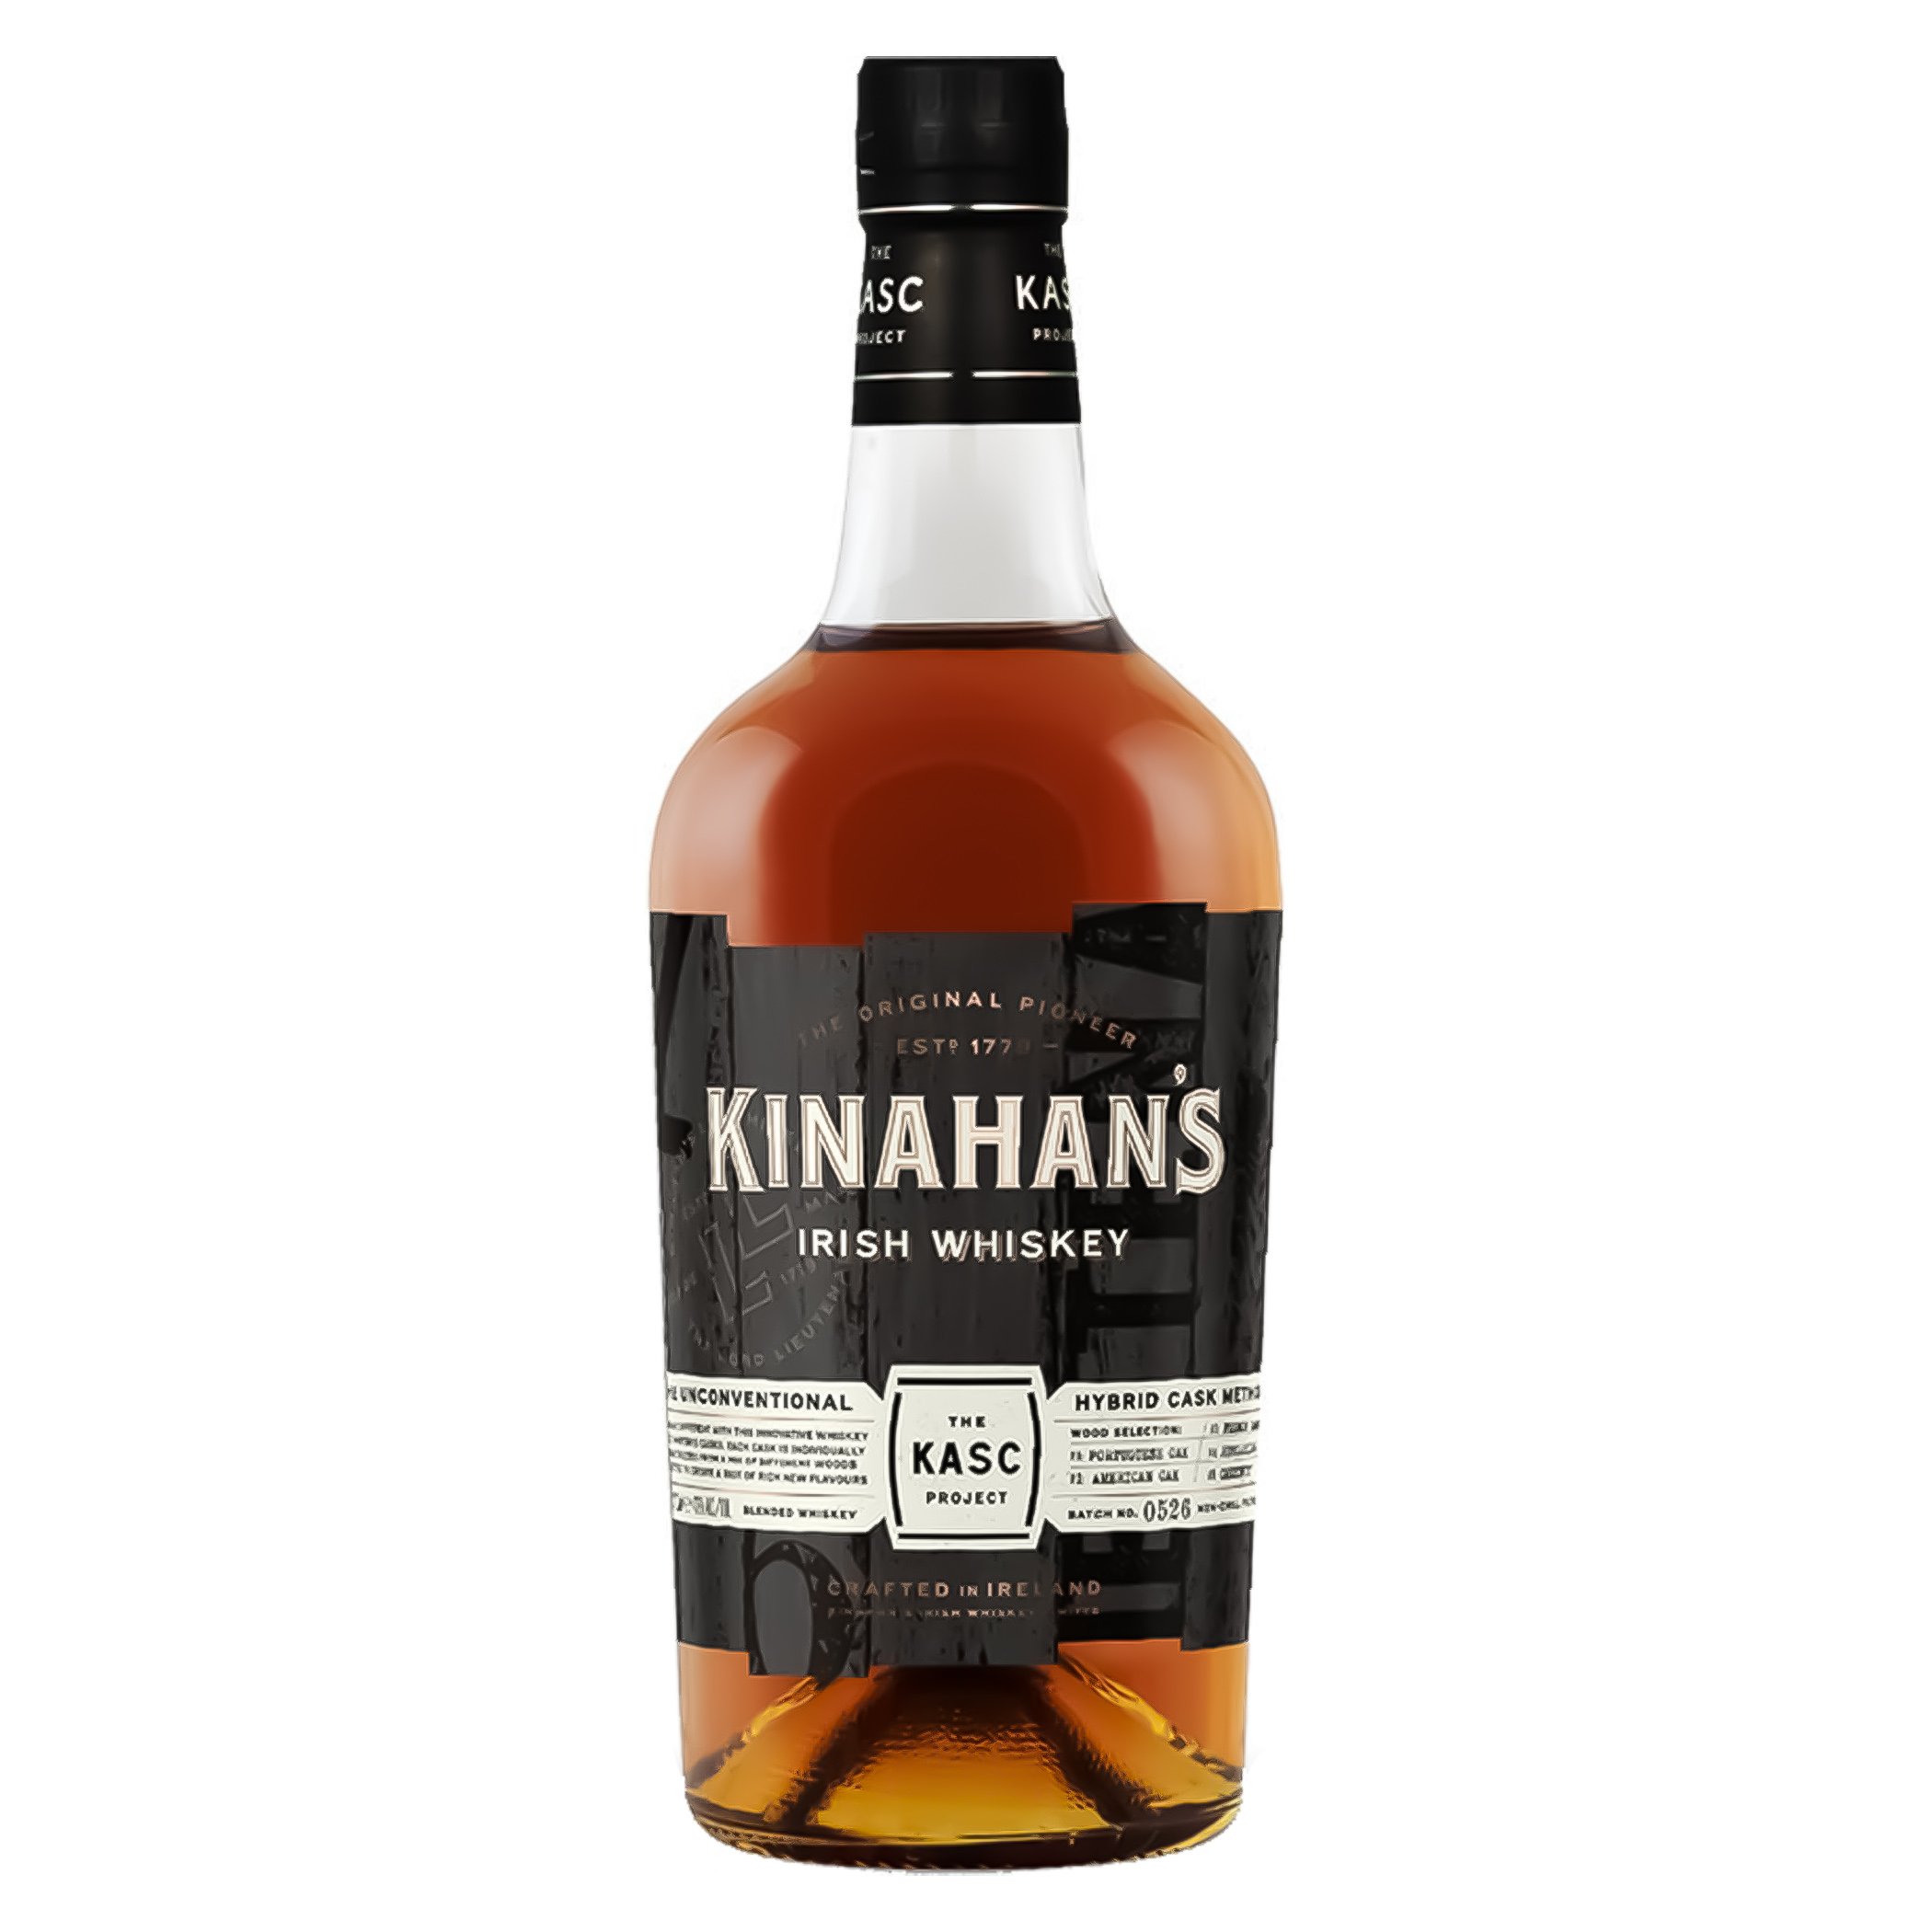 Kinahan's Kasc Irish Whiskey